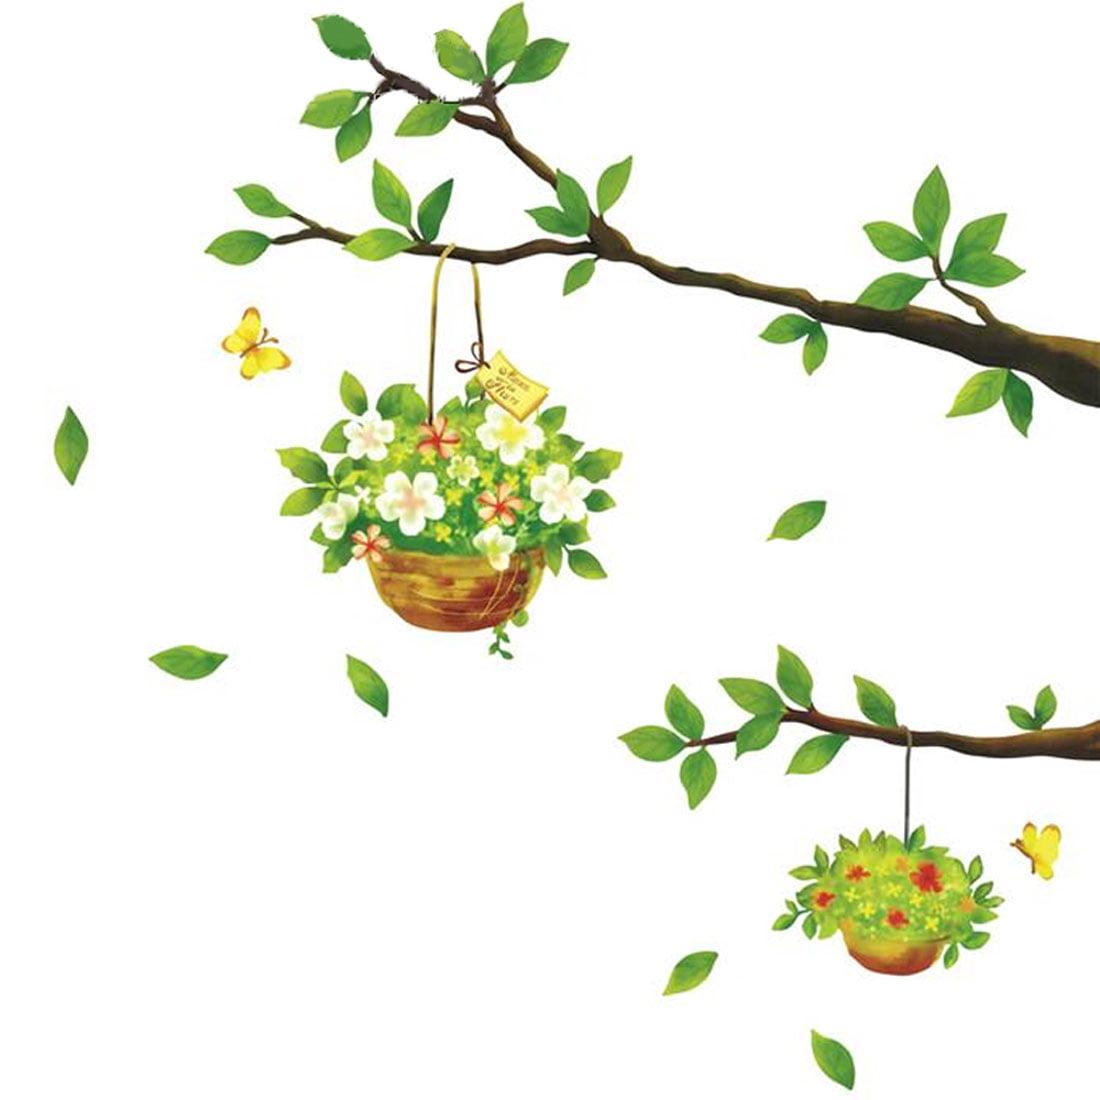 Tree Flowerpot Pattern Adhesive Wall Sticker Decal Wallpaper 70 x 50cm